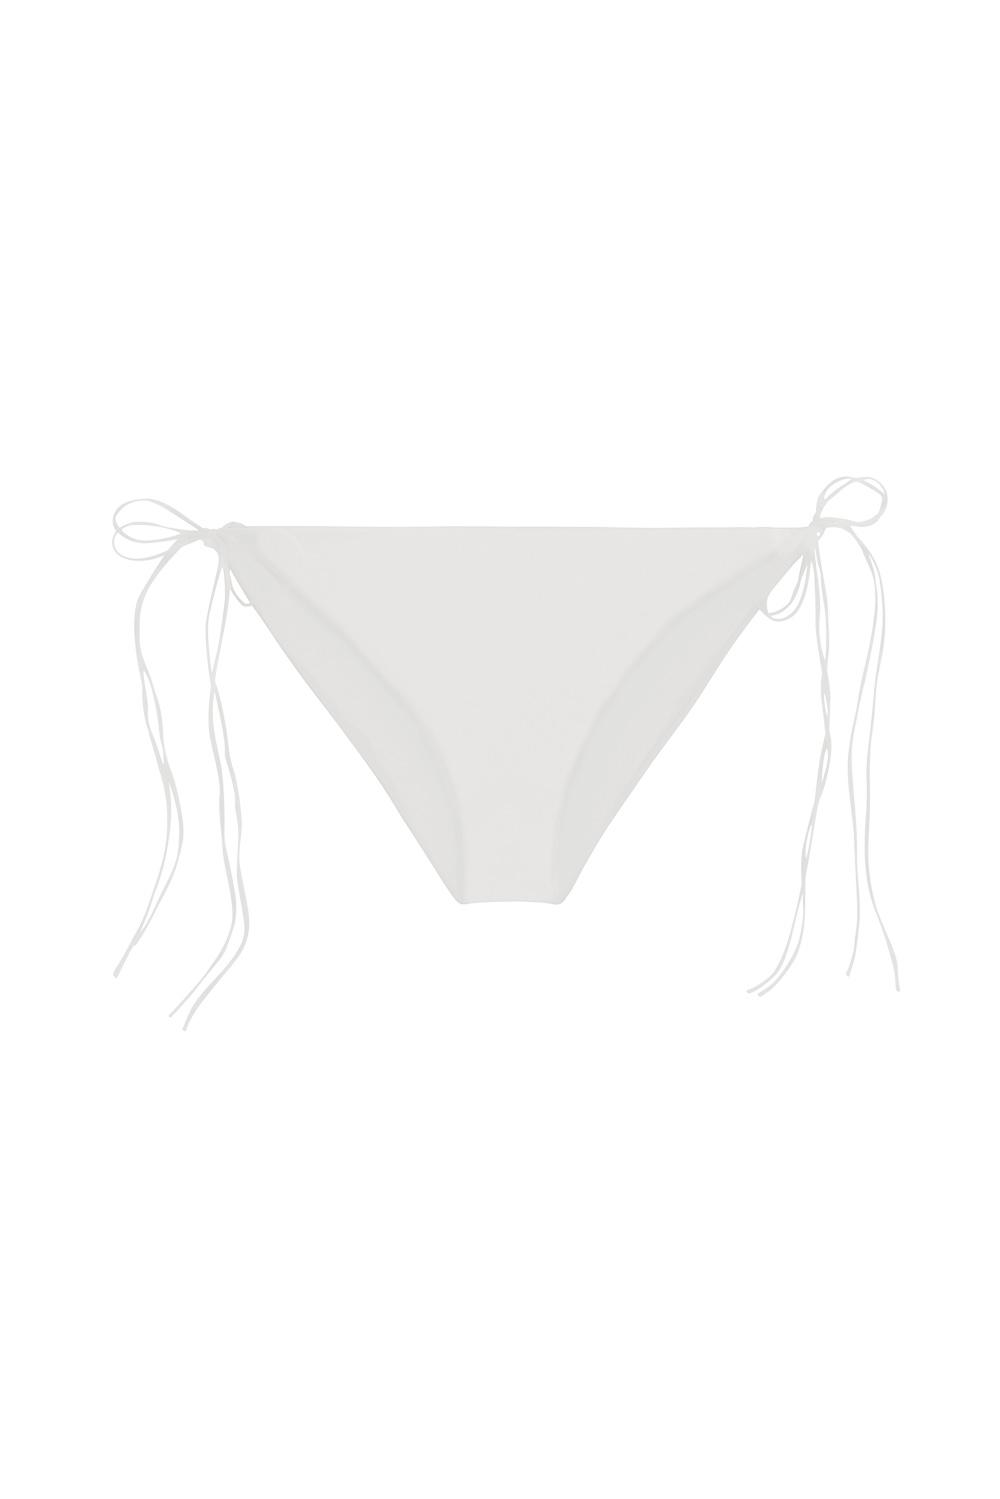 Sustainable Luxury Swimwear / Ropa de baño sostenible, eco bikini / bikini ecológico. Hermigua top in shell, by NOW_THEN